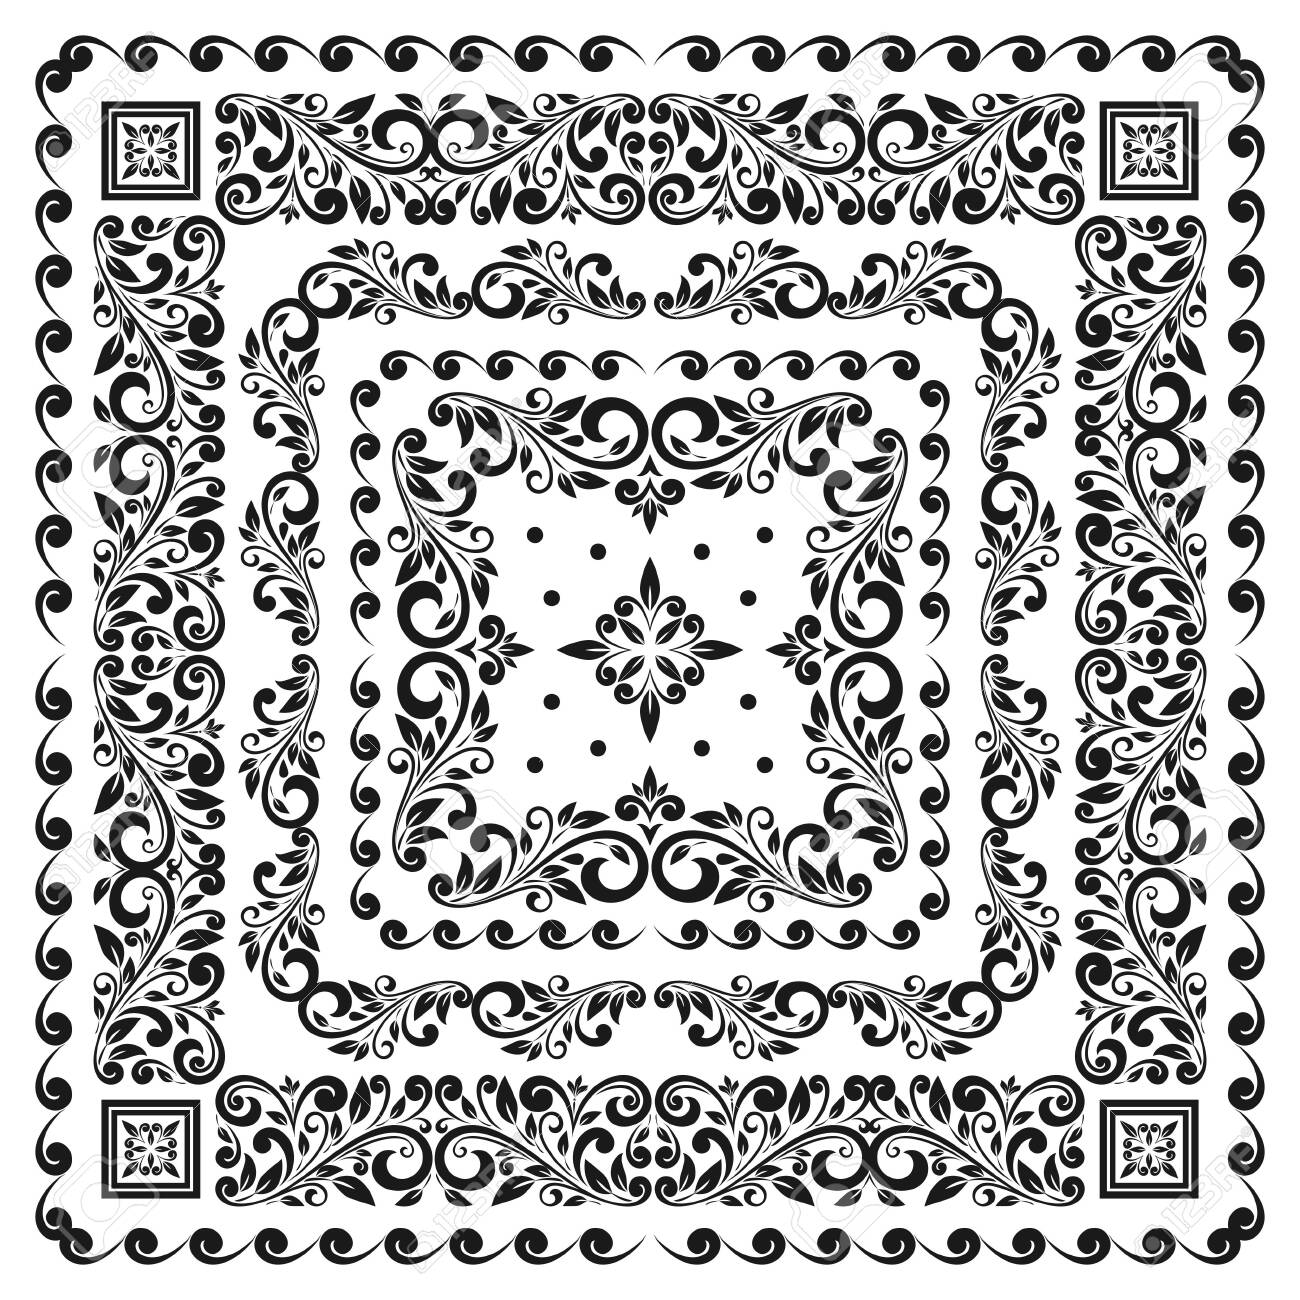 Square frame set template. Bandana with vintage ornament. - 137483726